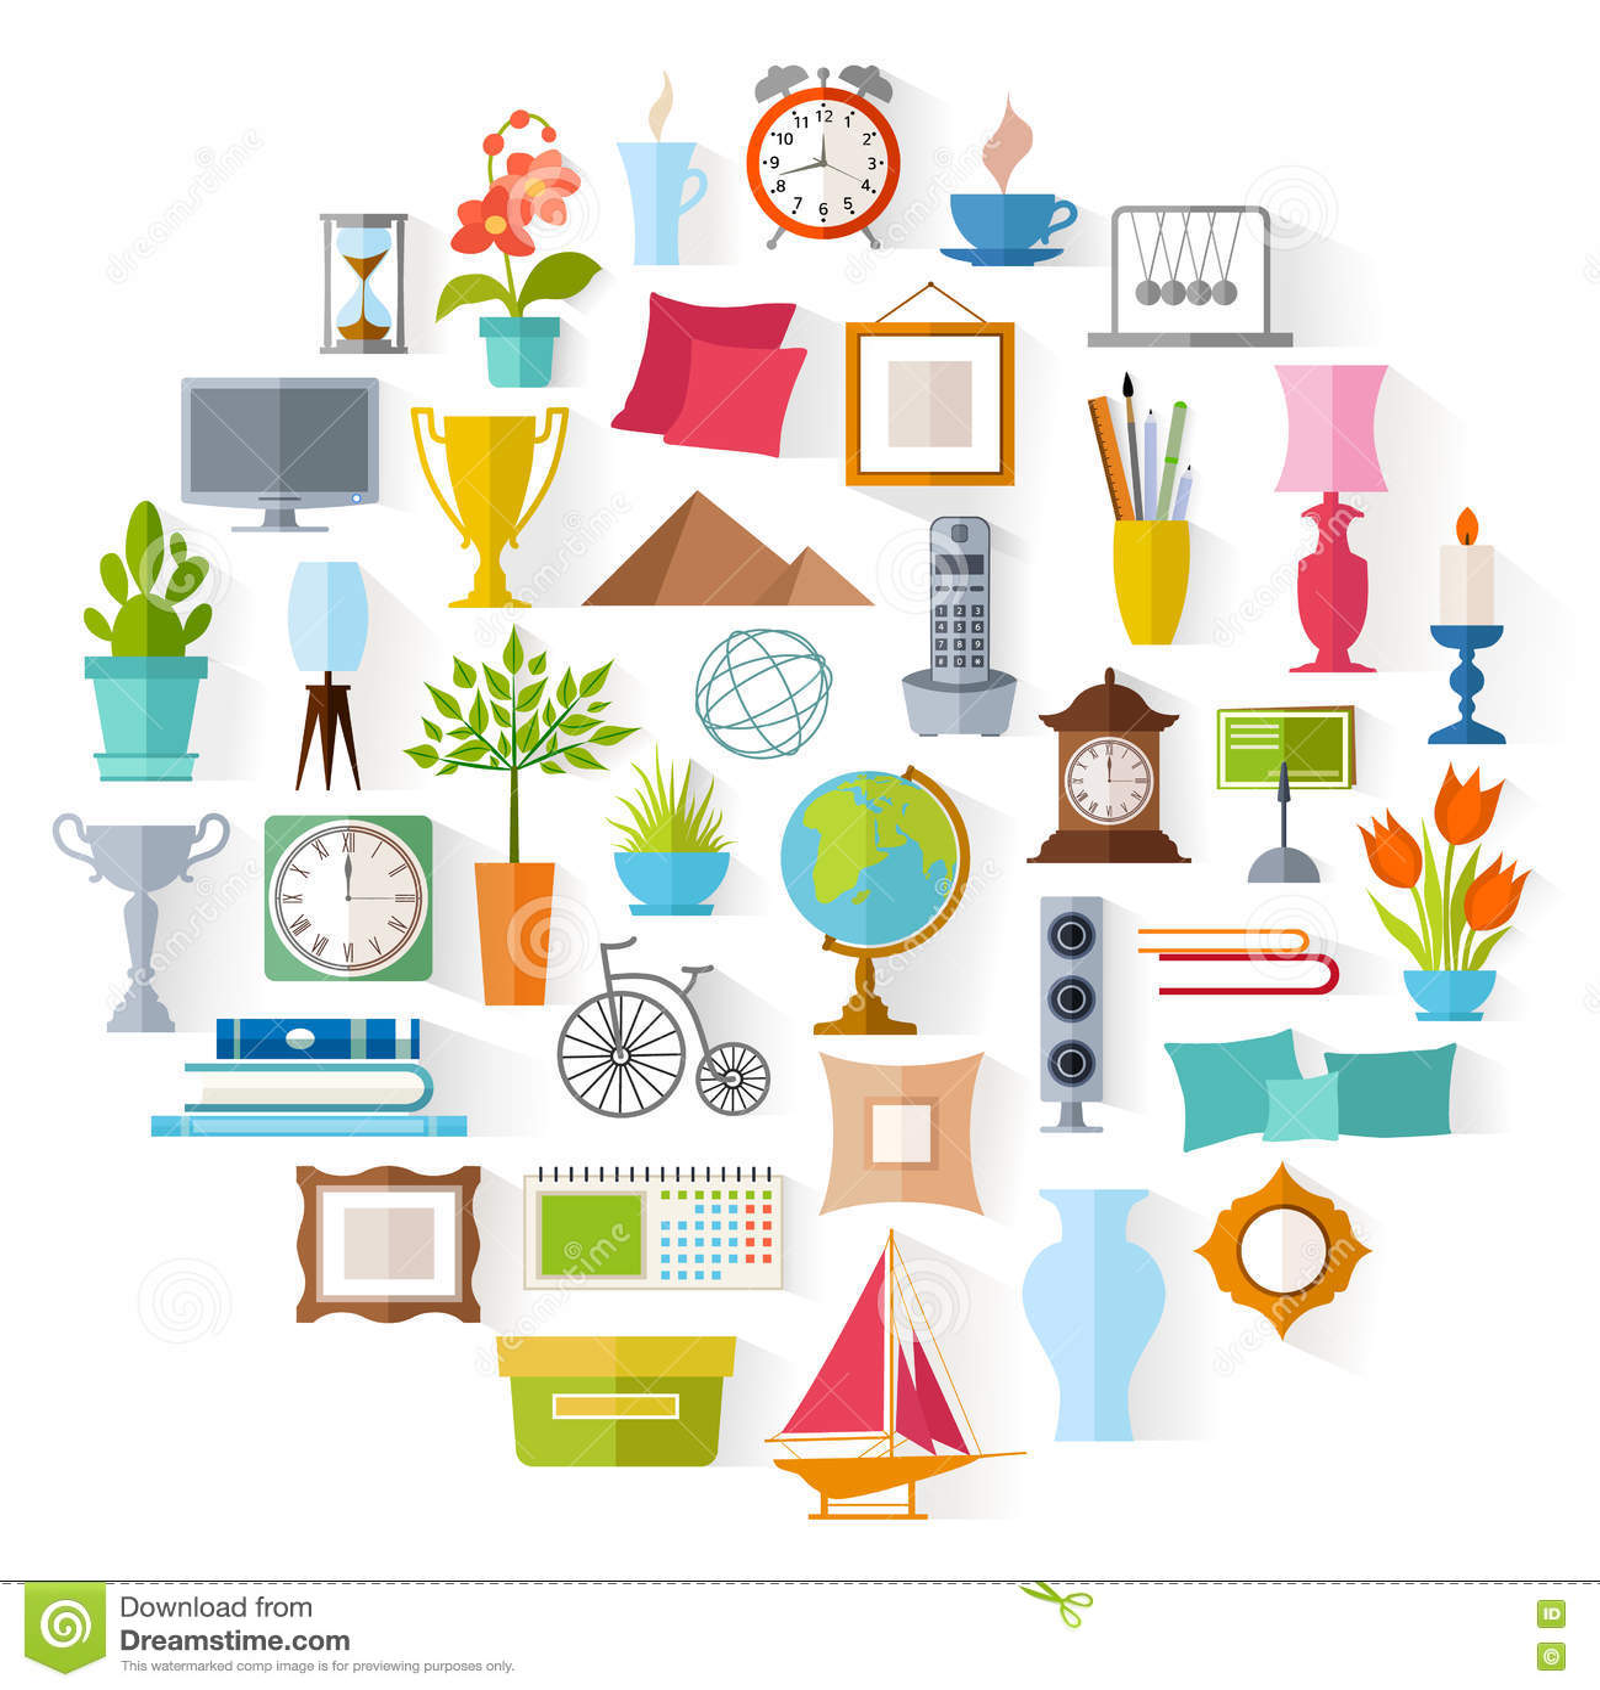 vector home decor interior design stock vector illustration of logo concept 72392015. Black Bedroom Furniture Sets. Home Design Ideas